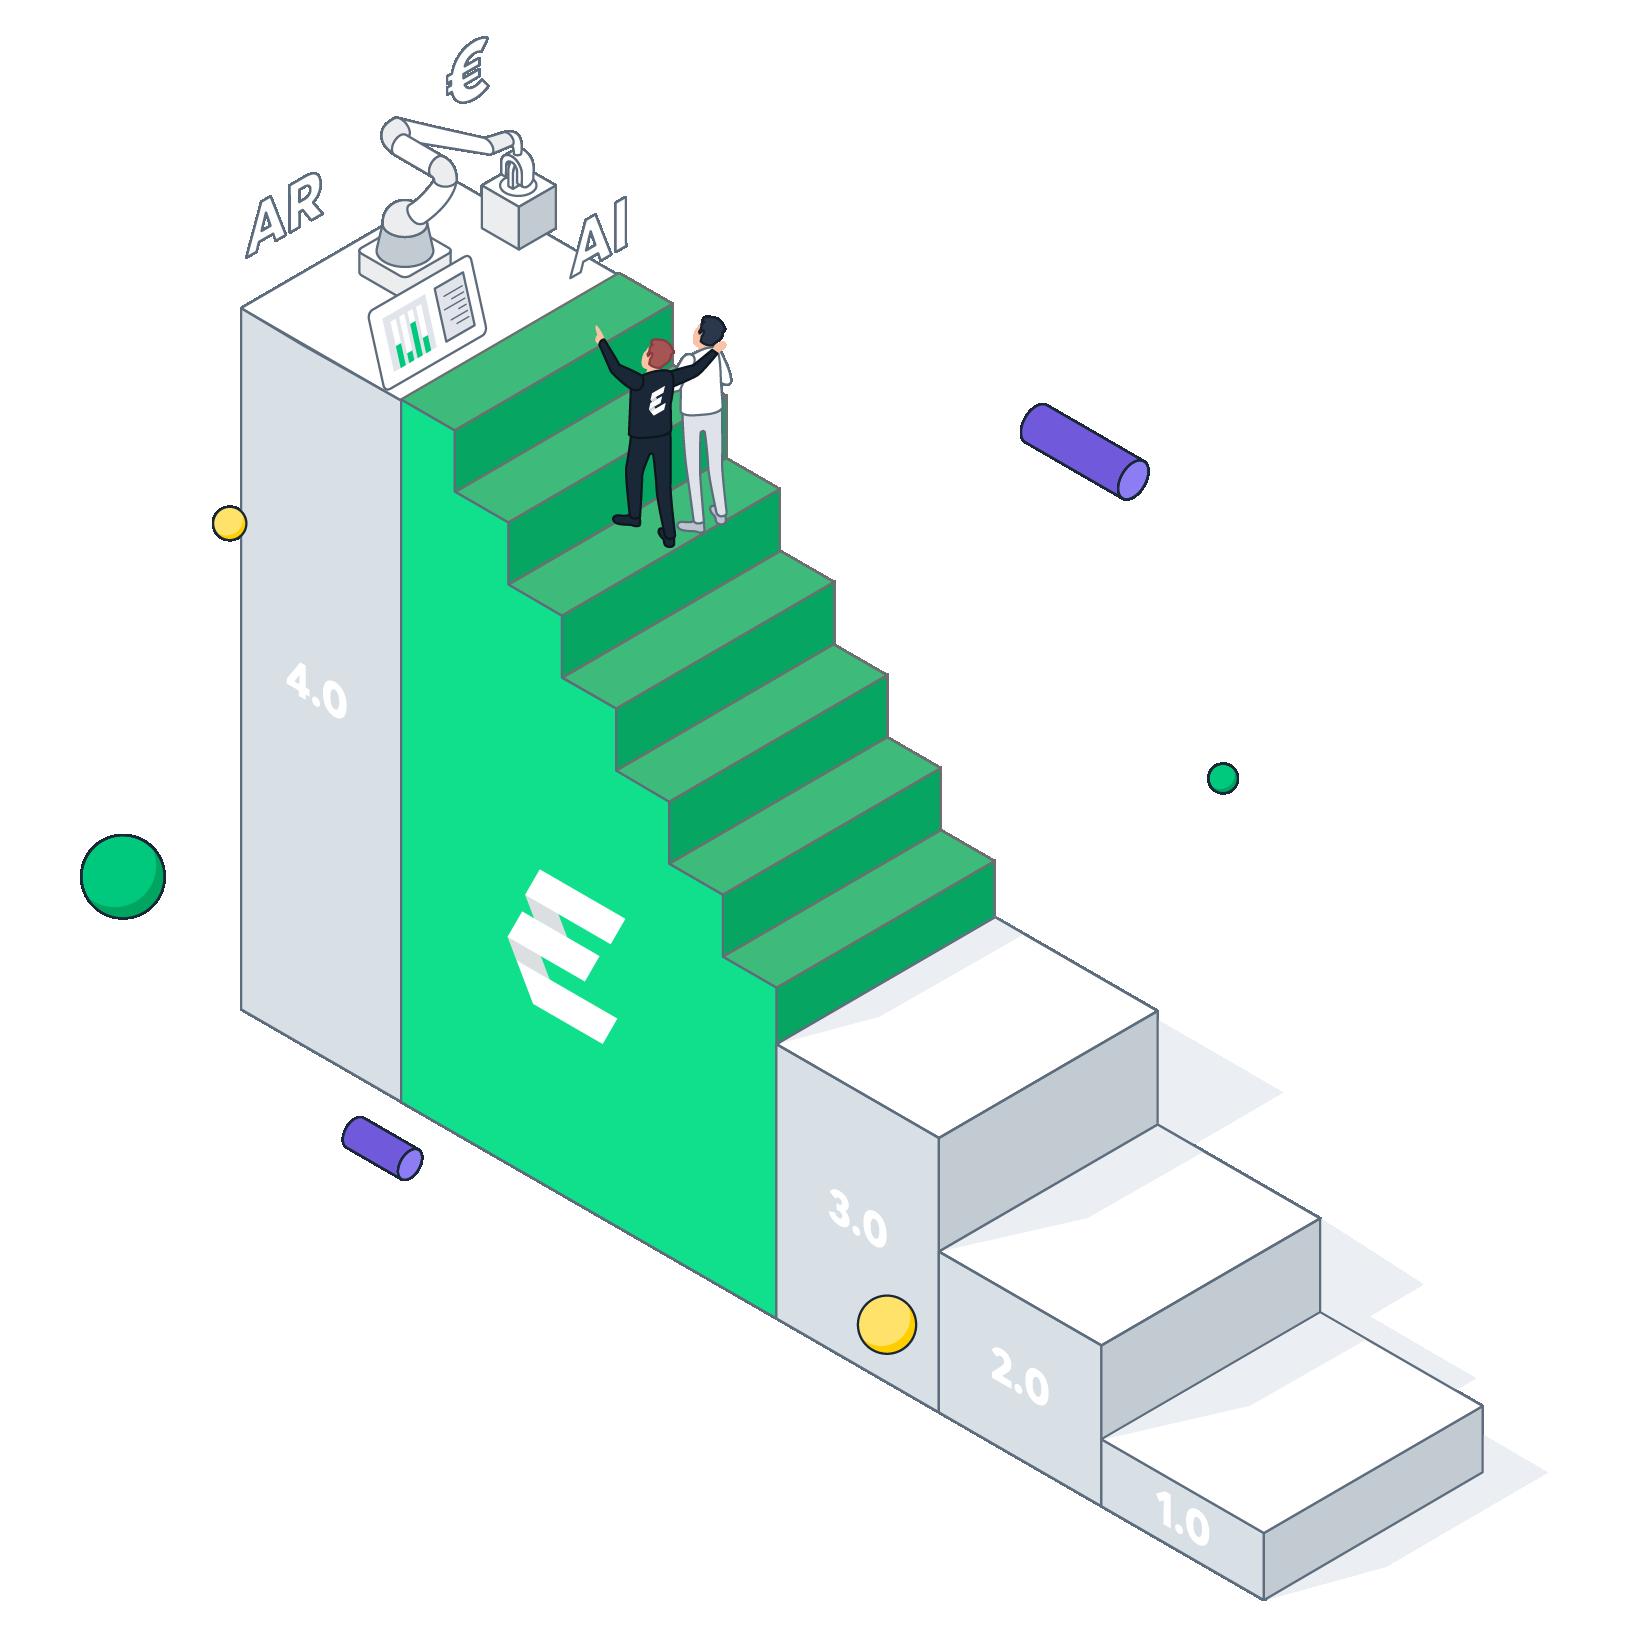 Ewattch as a gateway up to 4.0